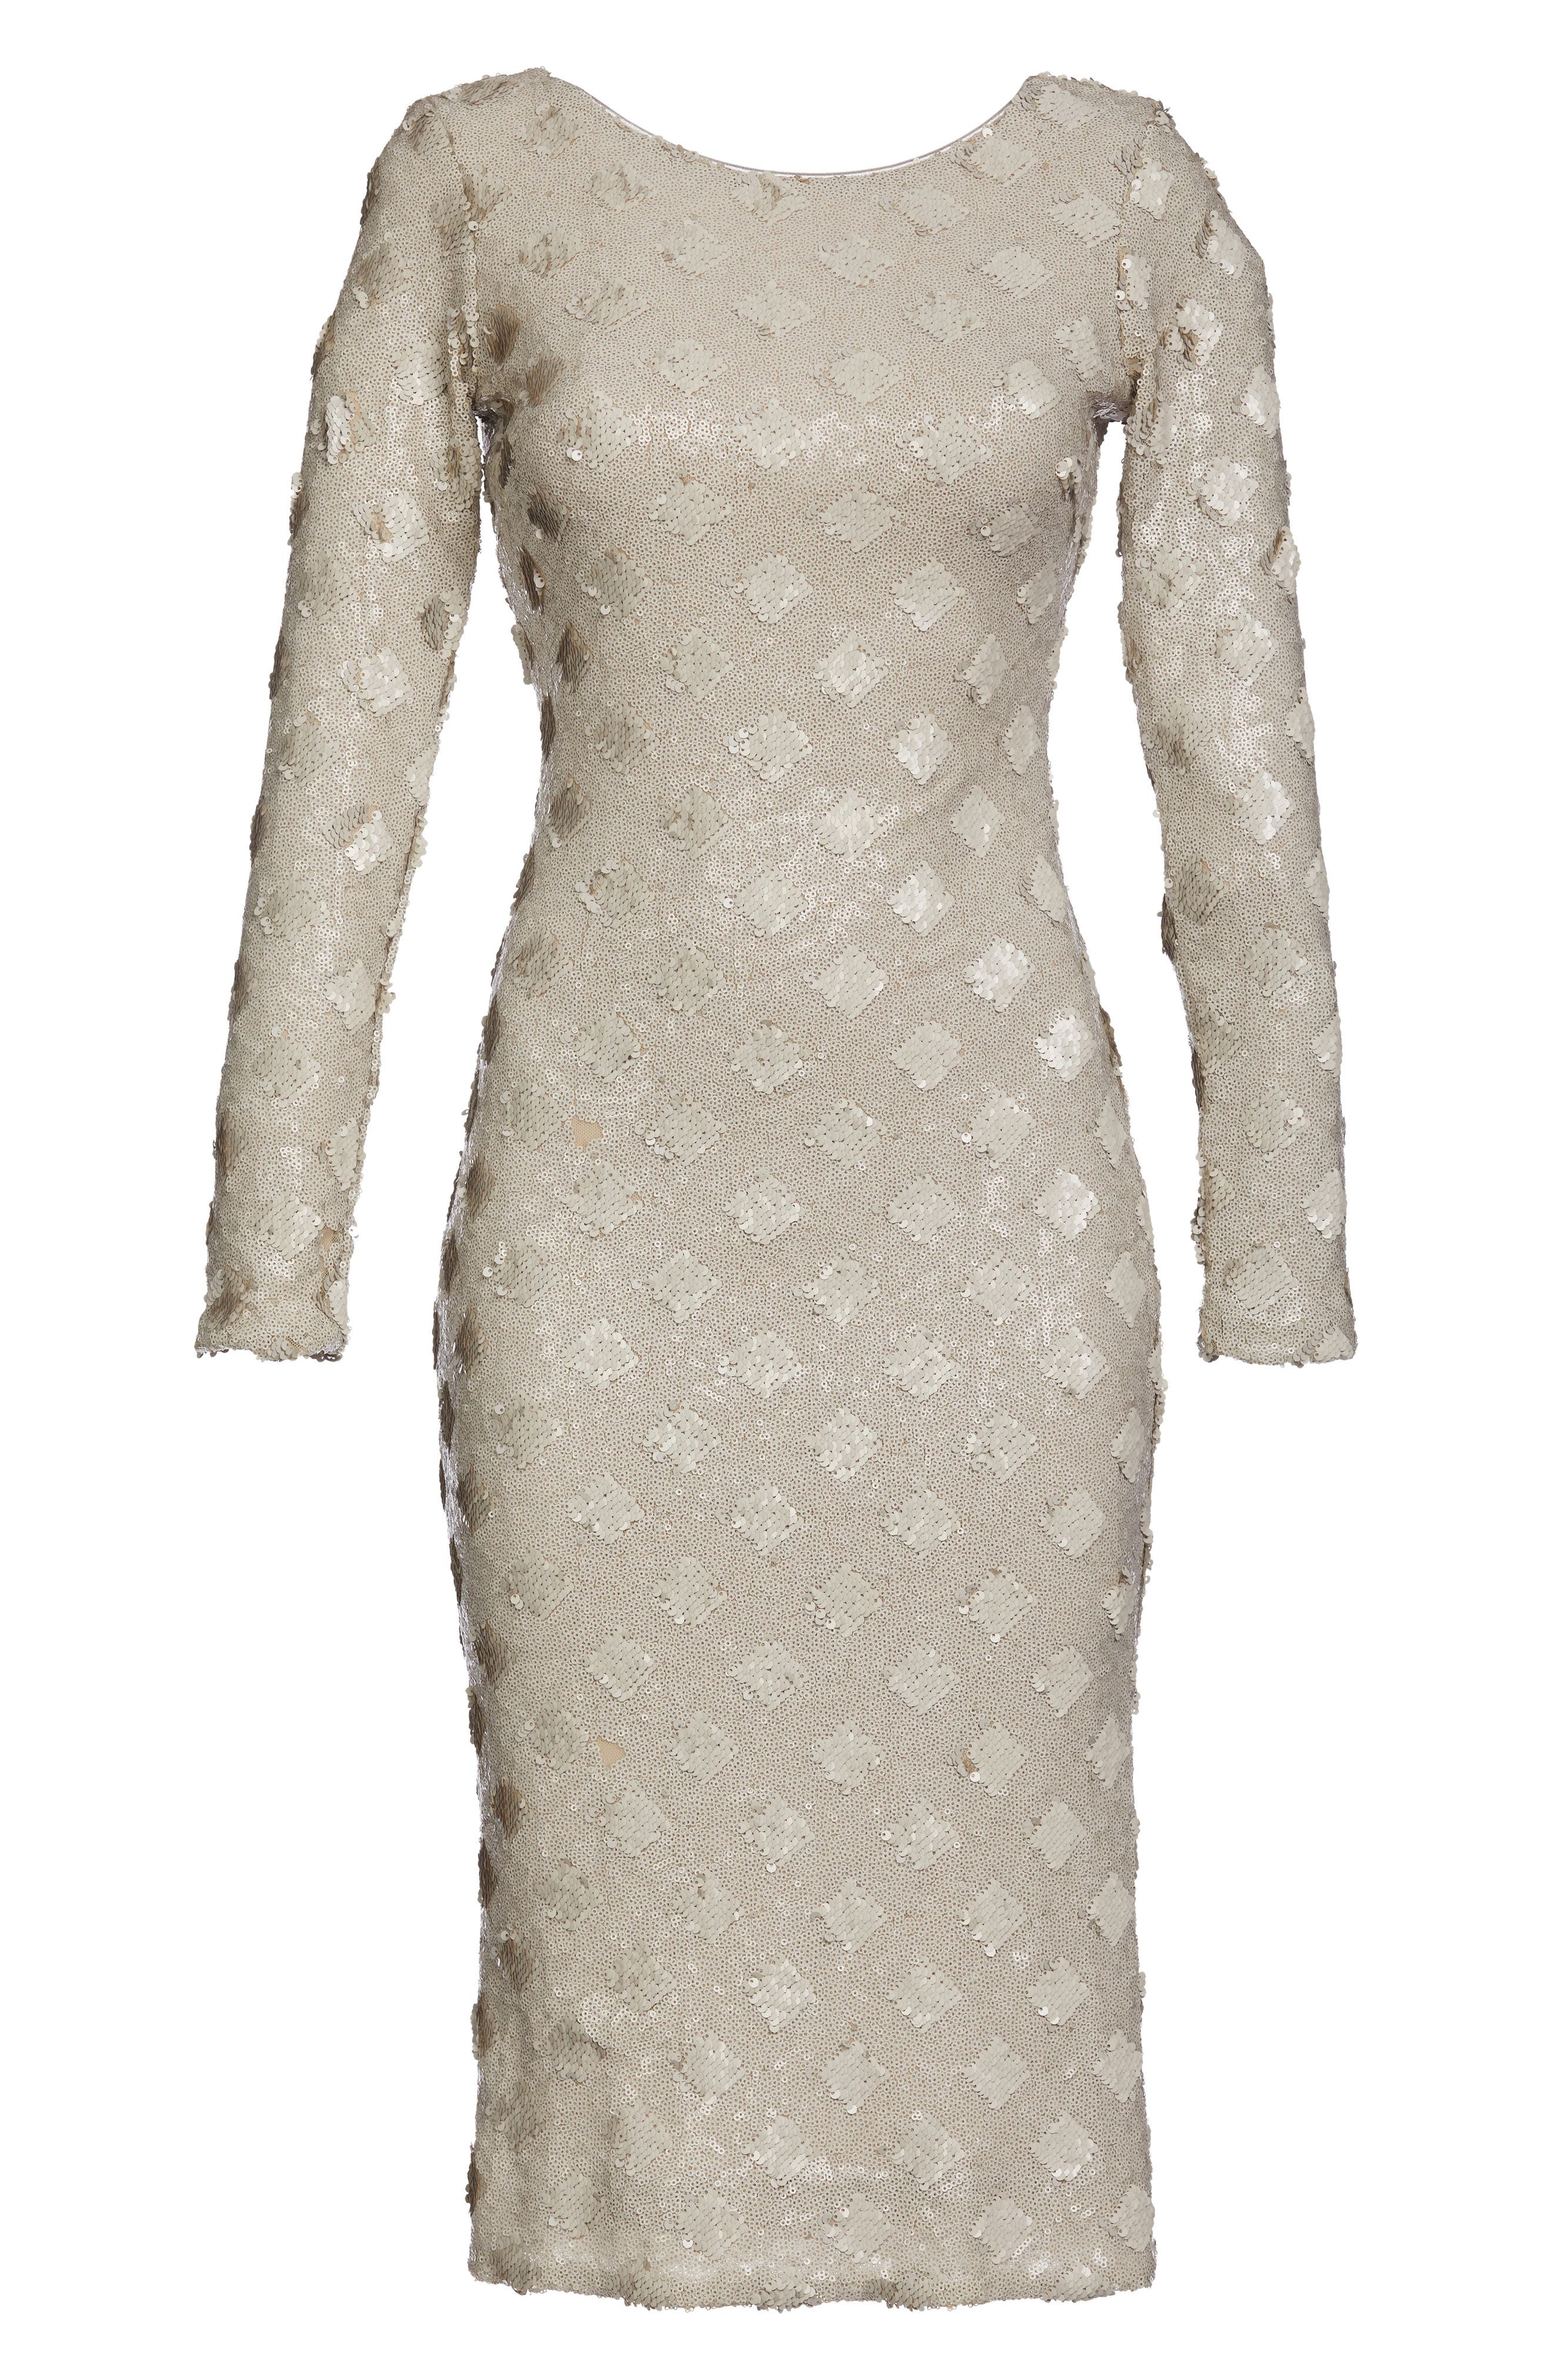 Emery Sequin Sheath Dress,                             Alternate thumbnail 5, color,                             Bone